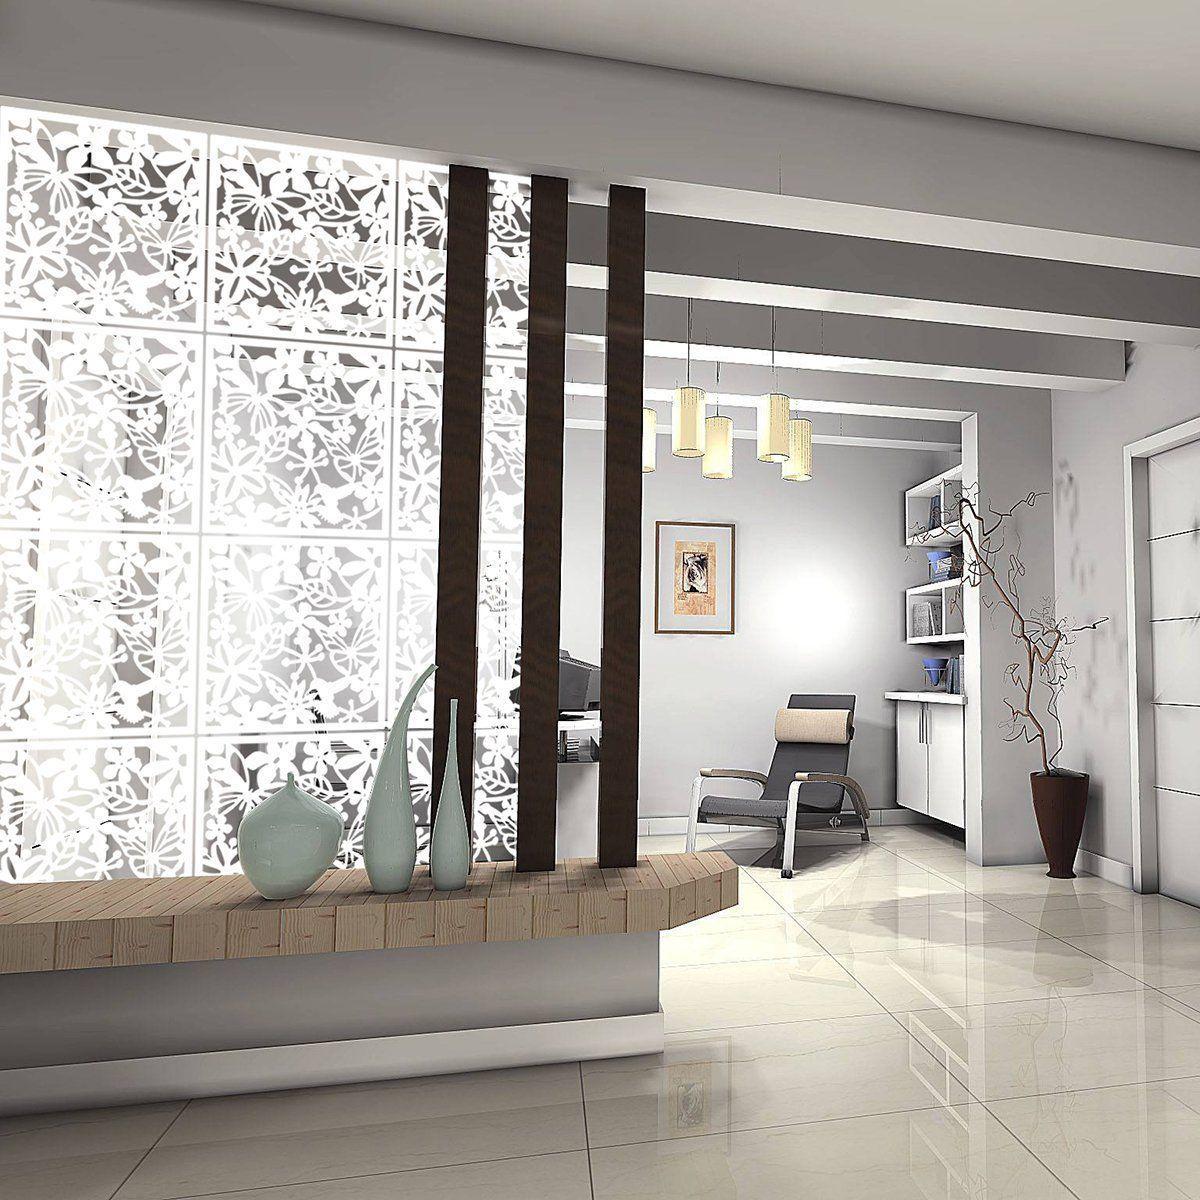 Kernorv DIY Hanging Room Divider Made of Environmentally